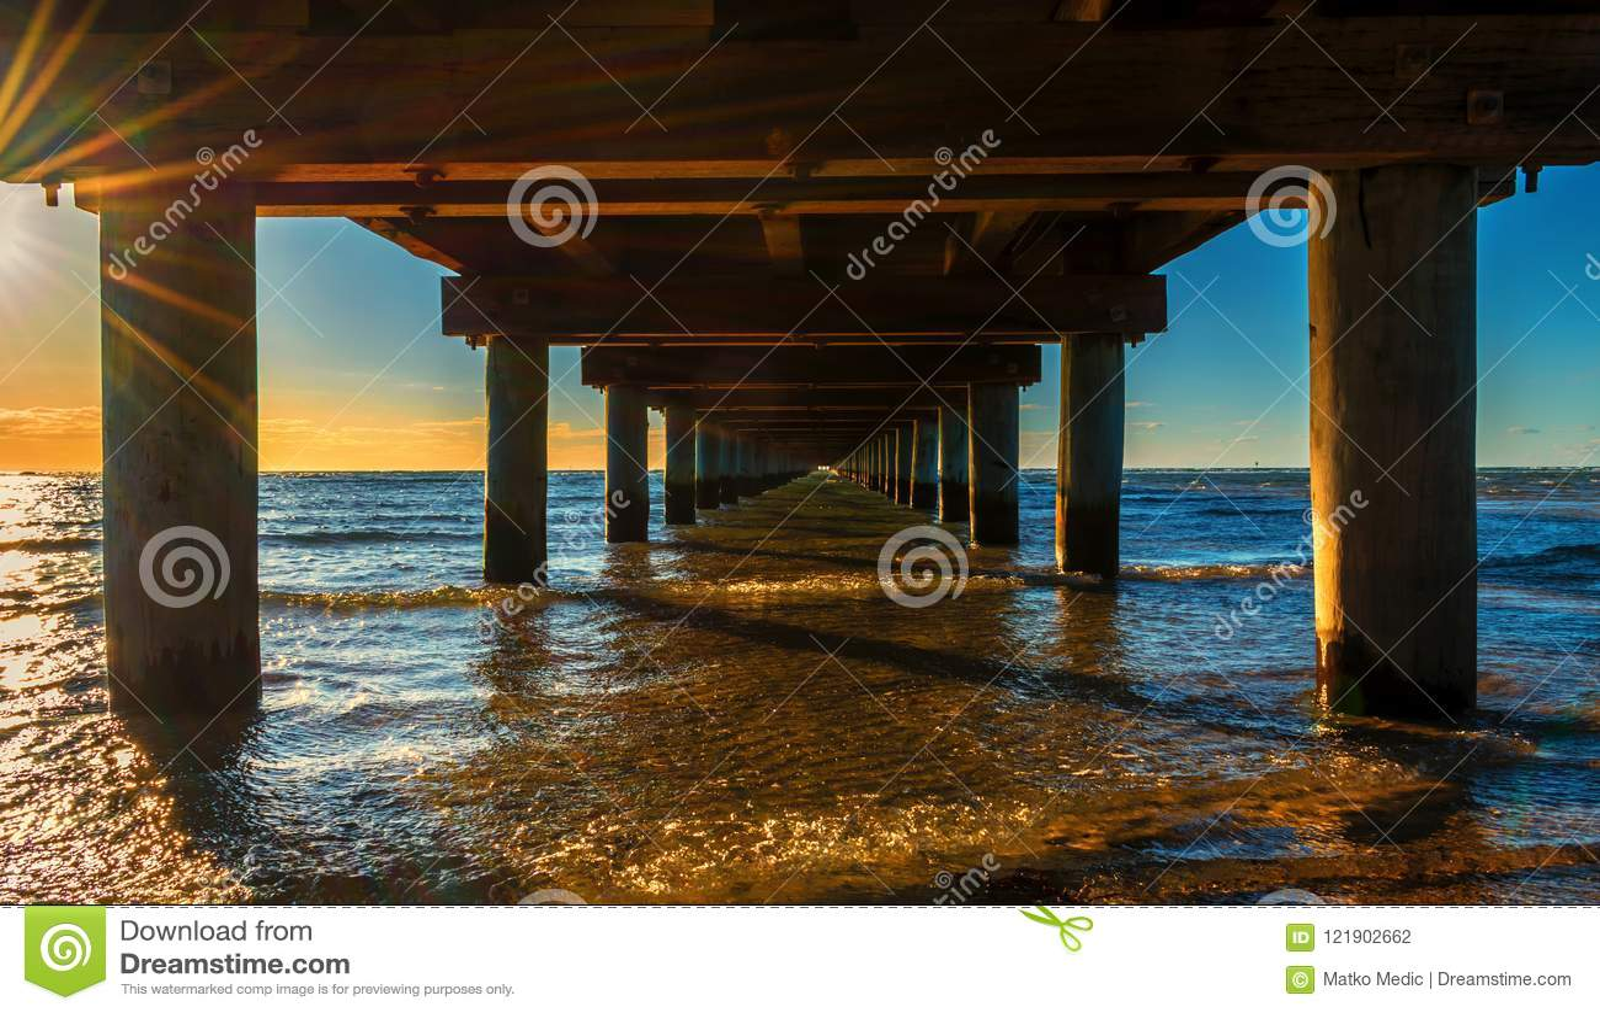 Under the pier at beautiful golden orange sunset